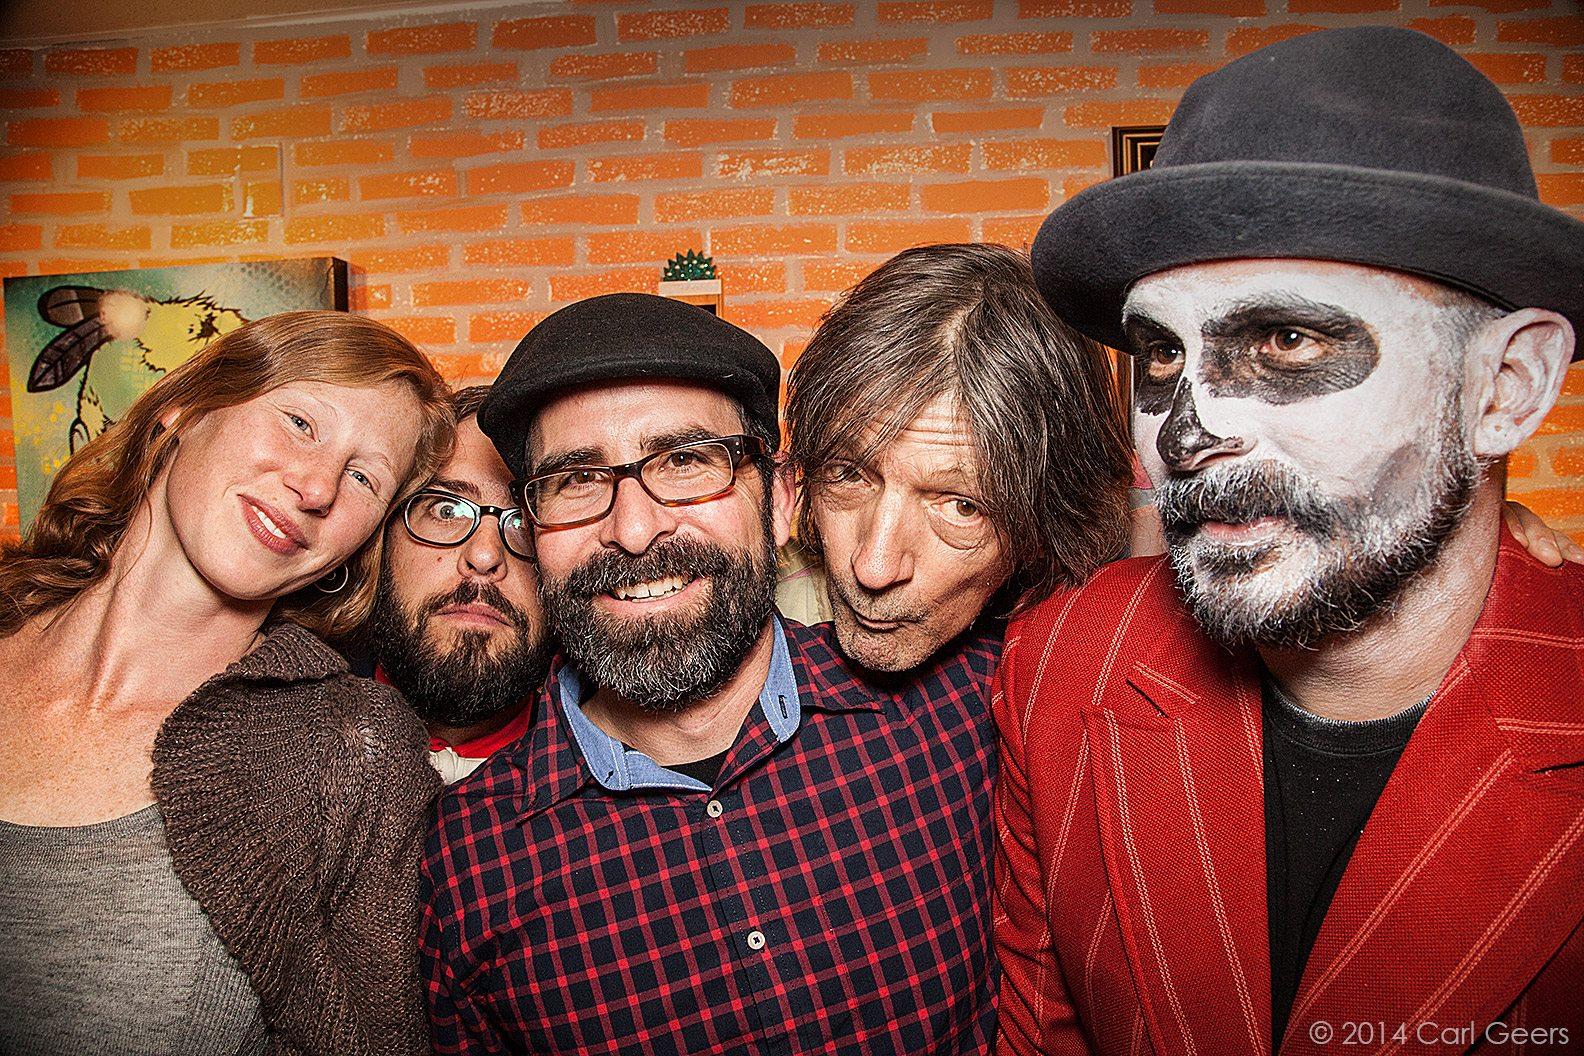 Kinahan, Kapustka, Dye, Stilson, Lopez - Circa 2014  - Photo: Carl Geers